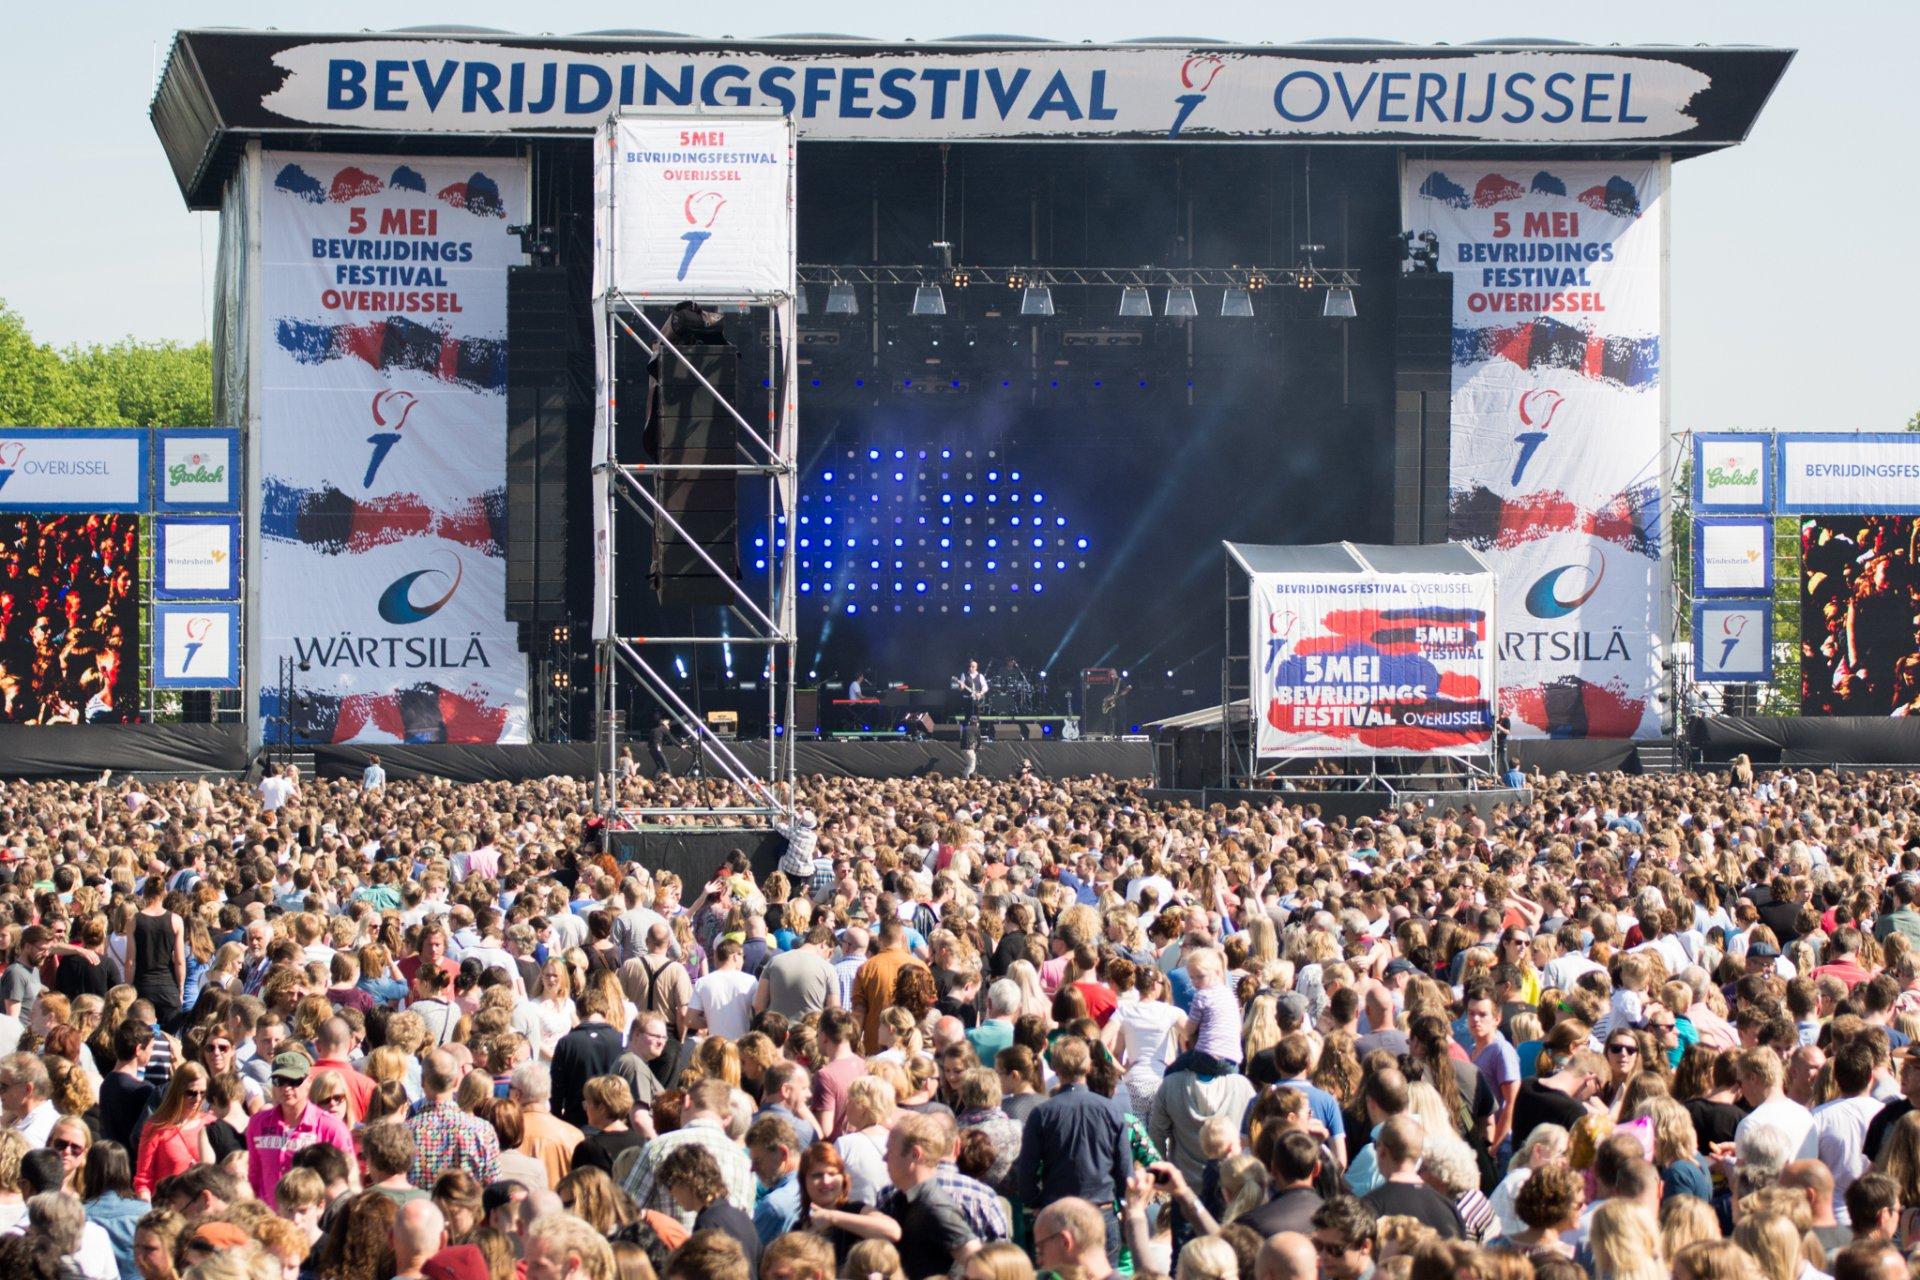 Cultuur in Overijssel - Zwolle - bevreidingsfestival